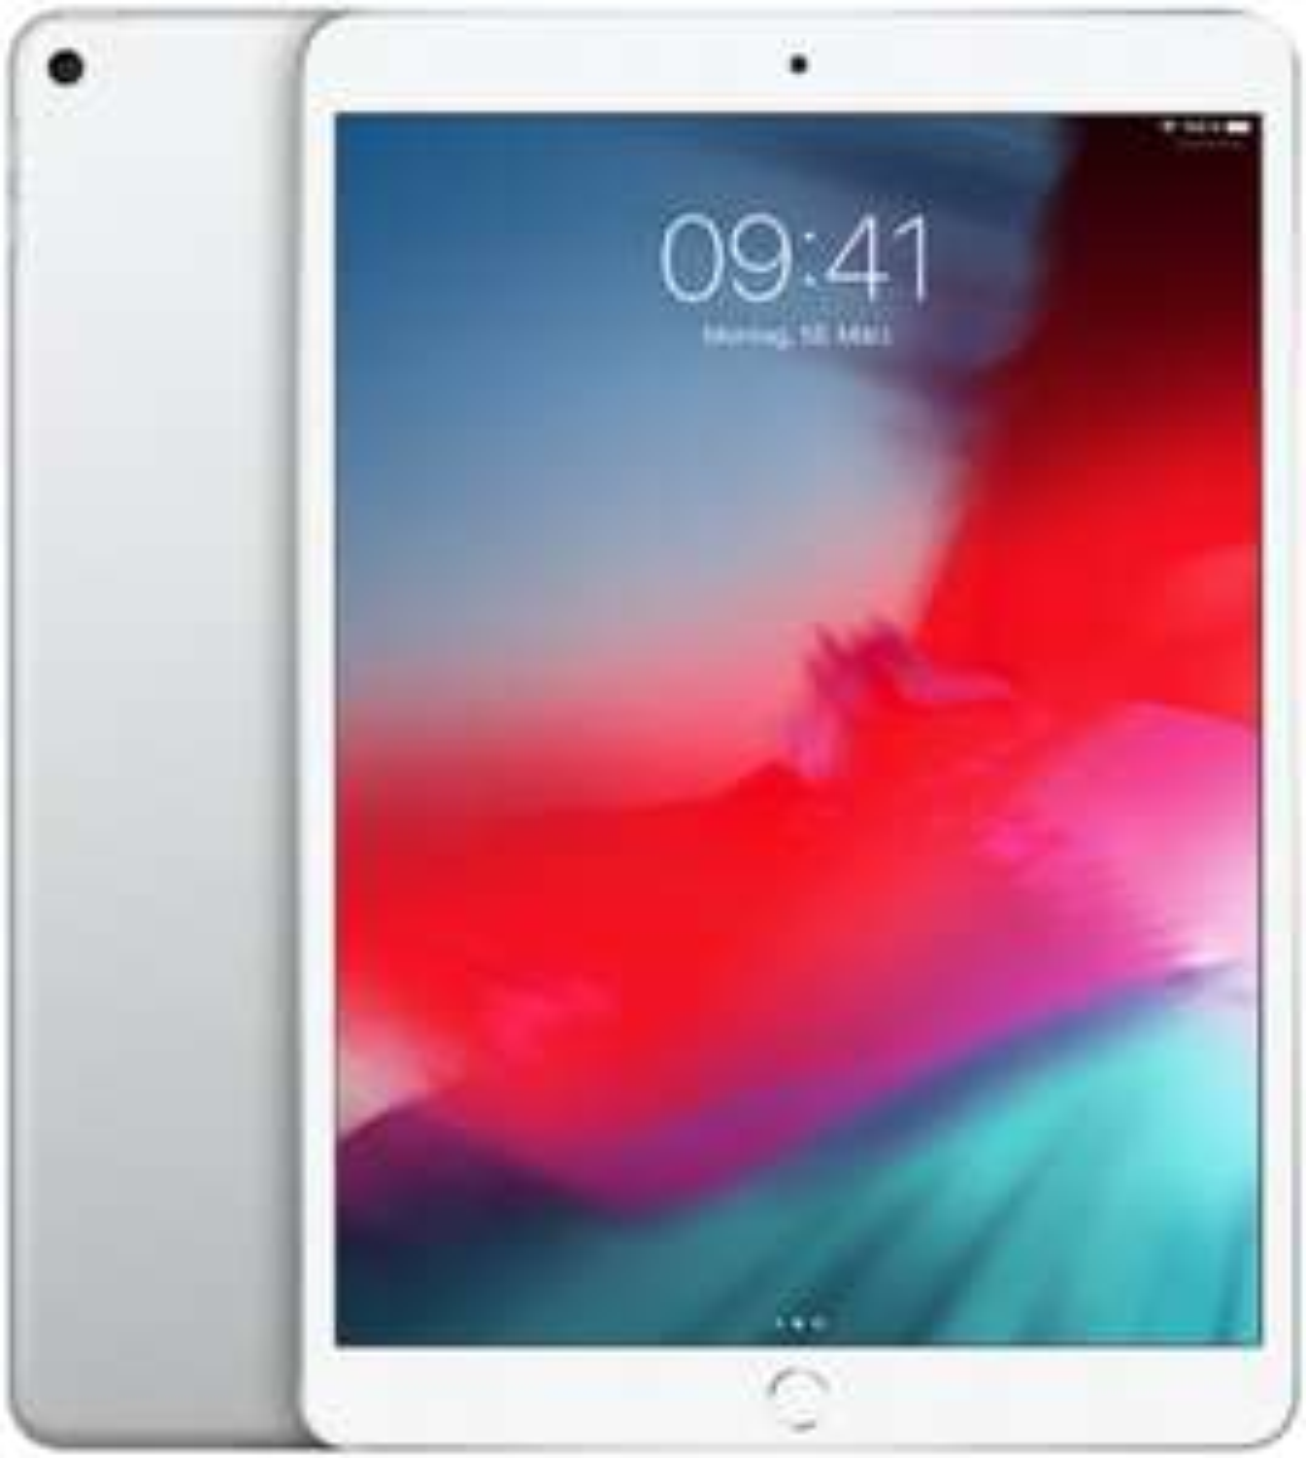 [idealo] Apple iPad Air (2019) Wi-Fi 64 GB - wenig verfügbar